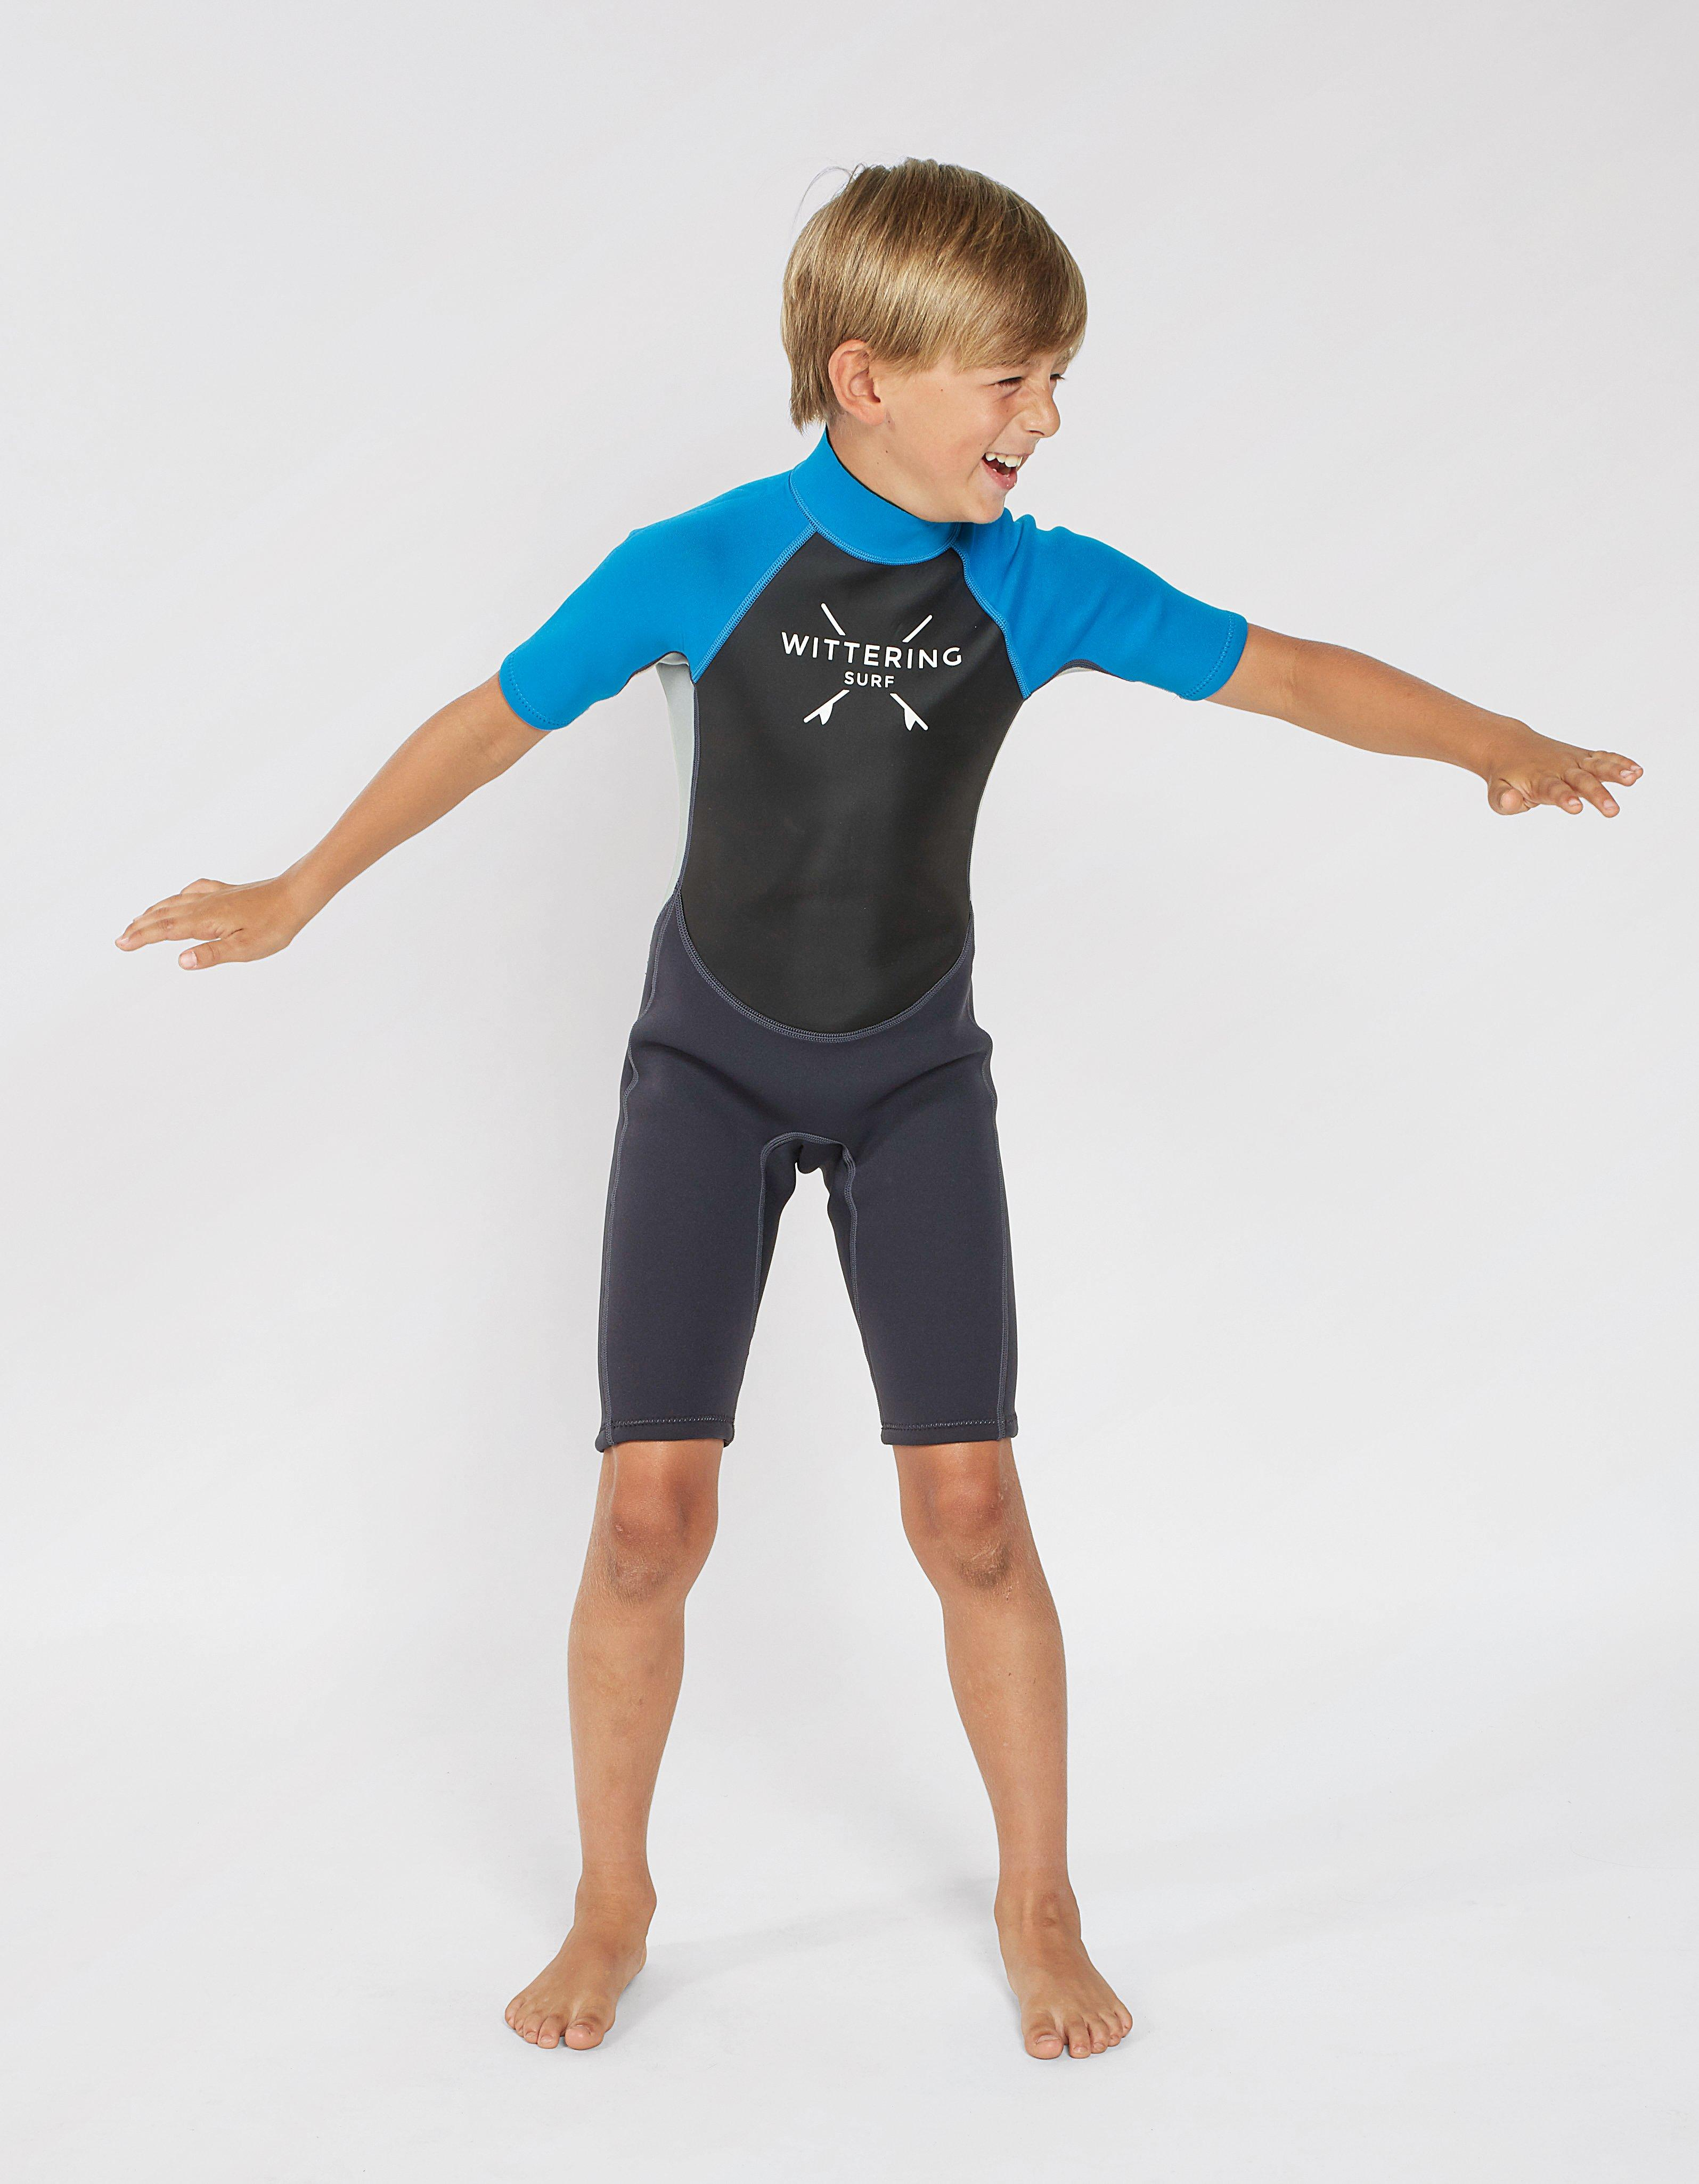 Wittering Surf Kids' Summer Shortie Wetsuit